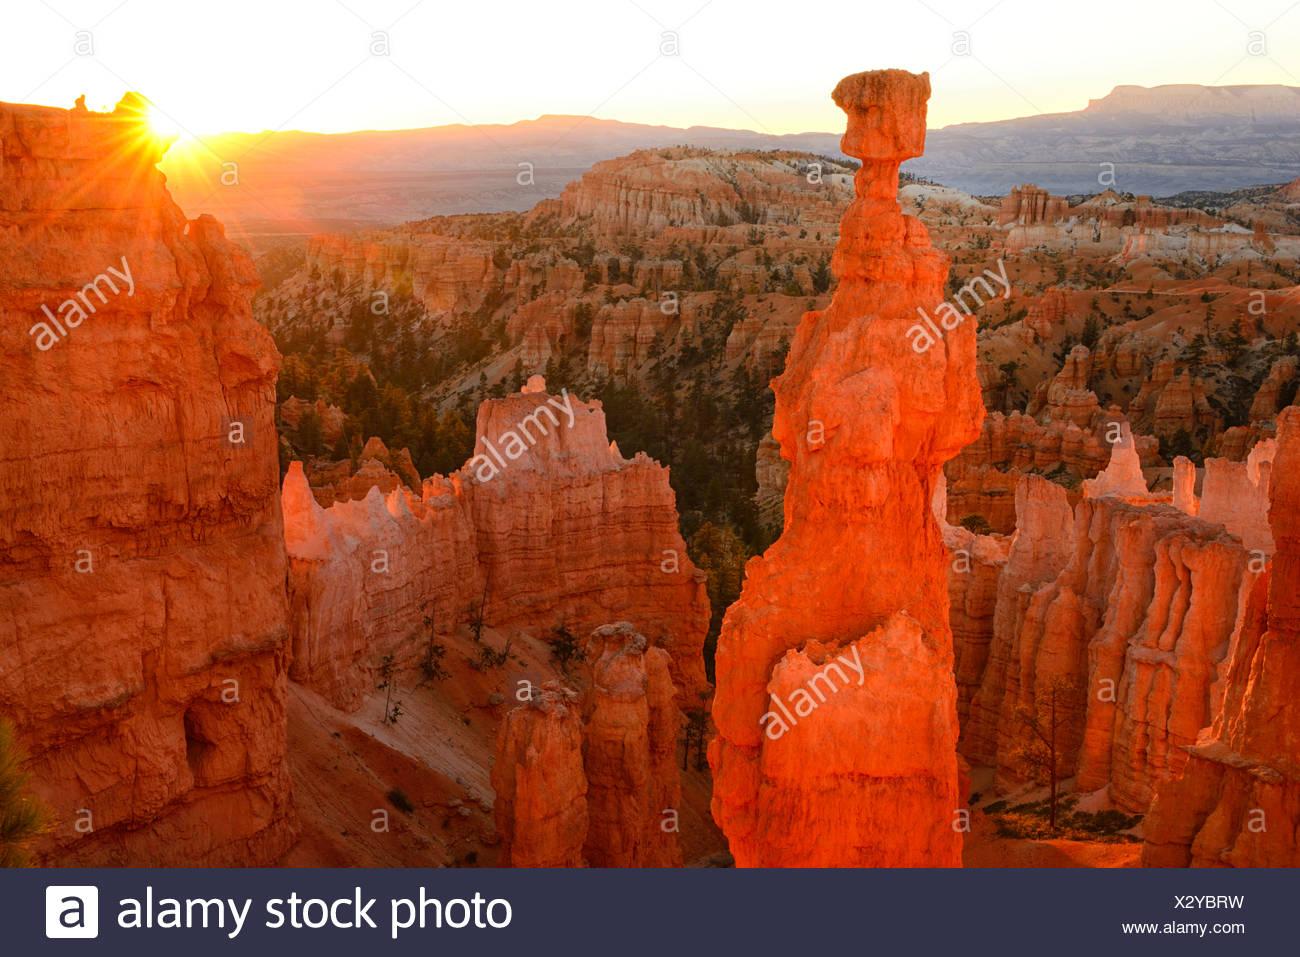 USA, United States, America, Utah, Canyon, North America, four corners, Colorado, Plateau, Bryce Canyon, National Park, sunrise, - Stock Image